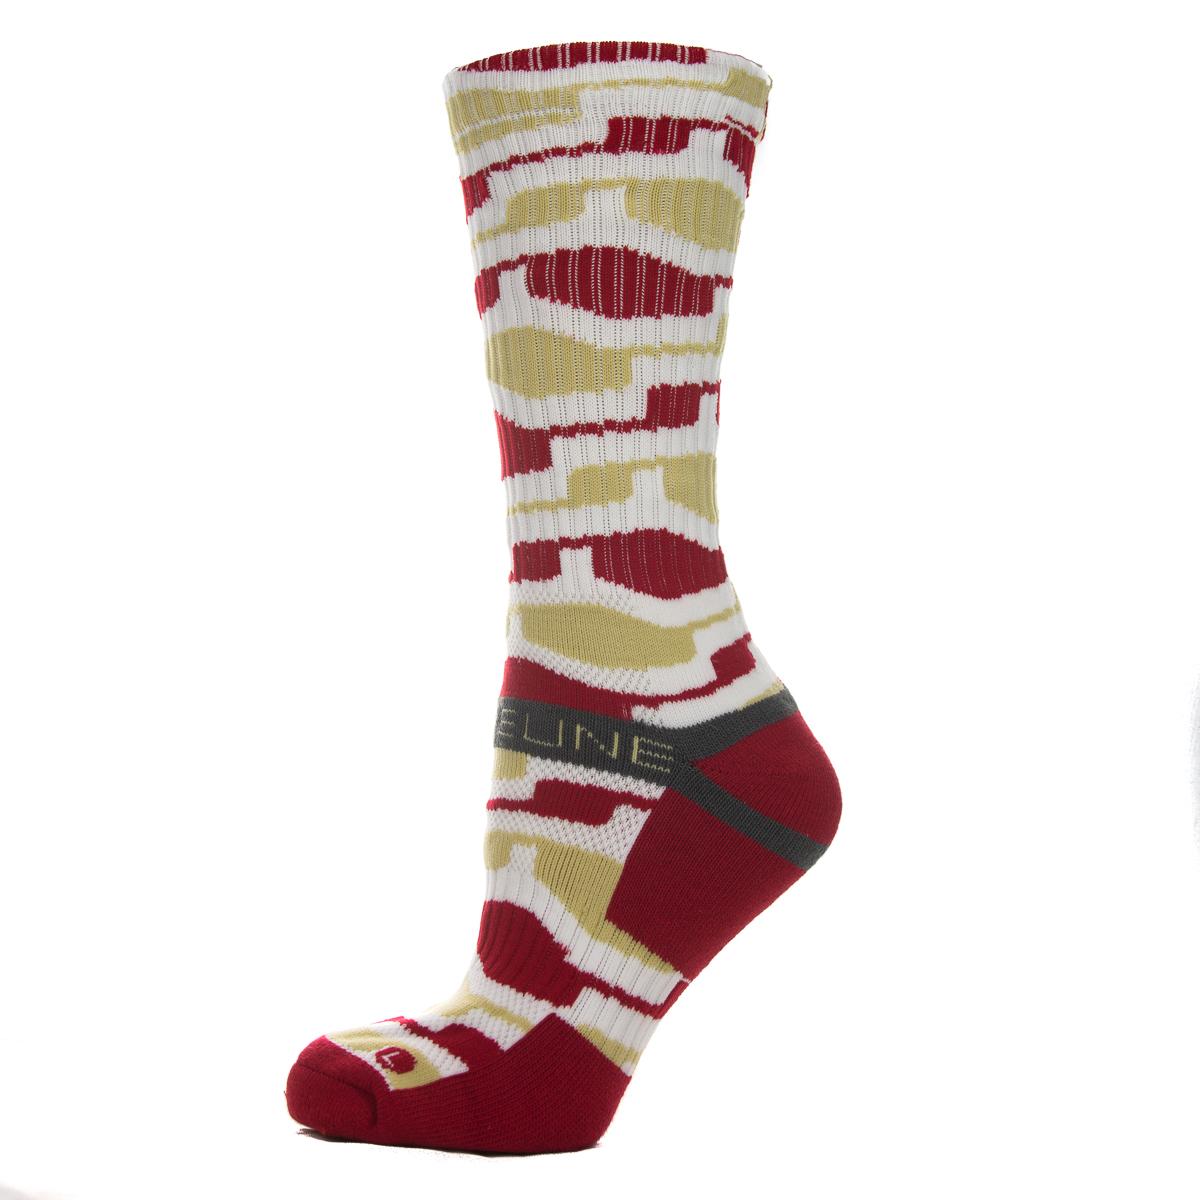 Athletic Crew Socks The Bay Gold/Scarlet Hex 1507011 Strapped Men's